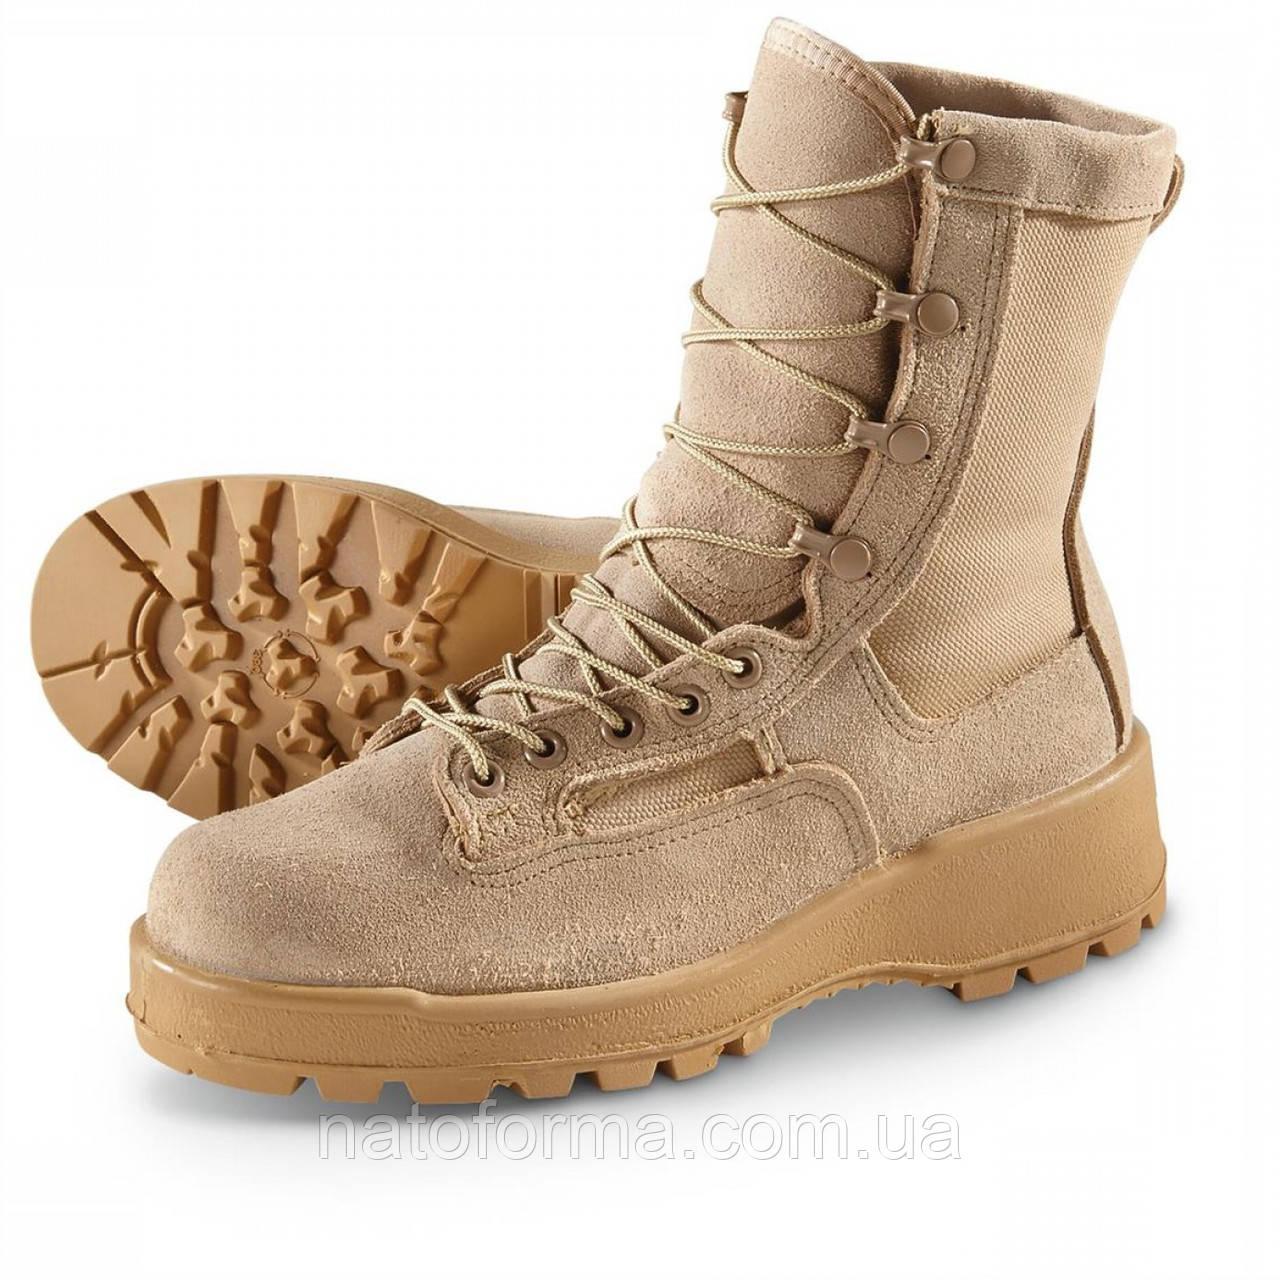 Берцы Altama Temperate Boots, Gore-Tex, армии США, оригинал